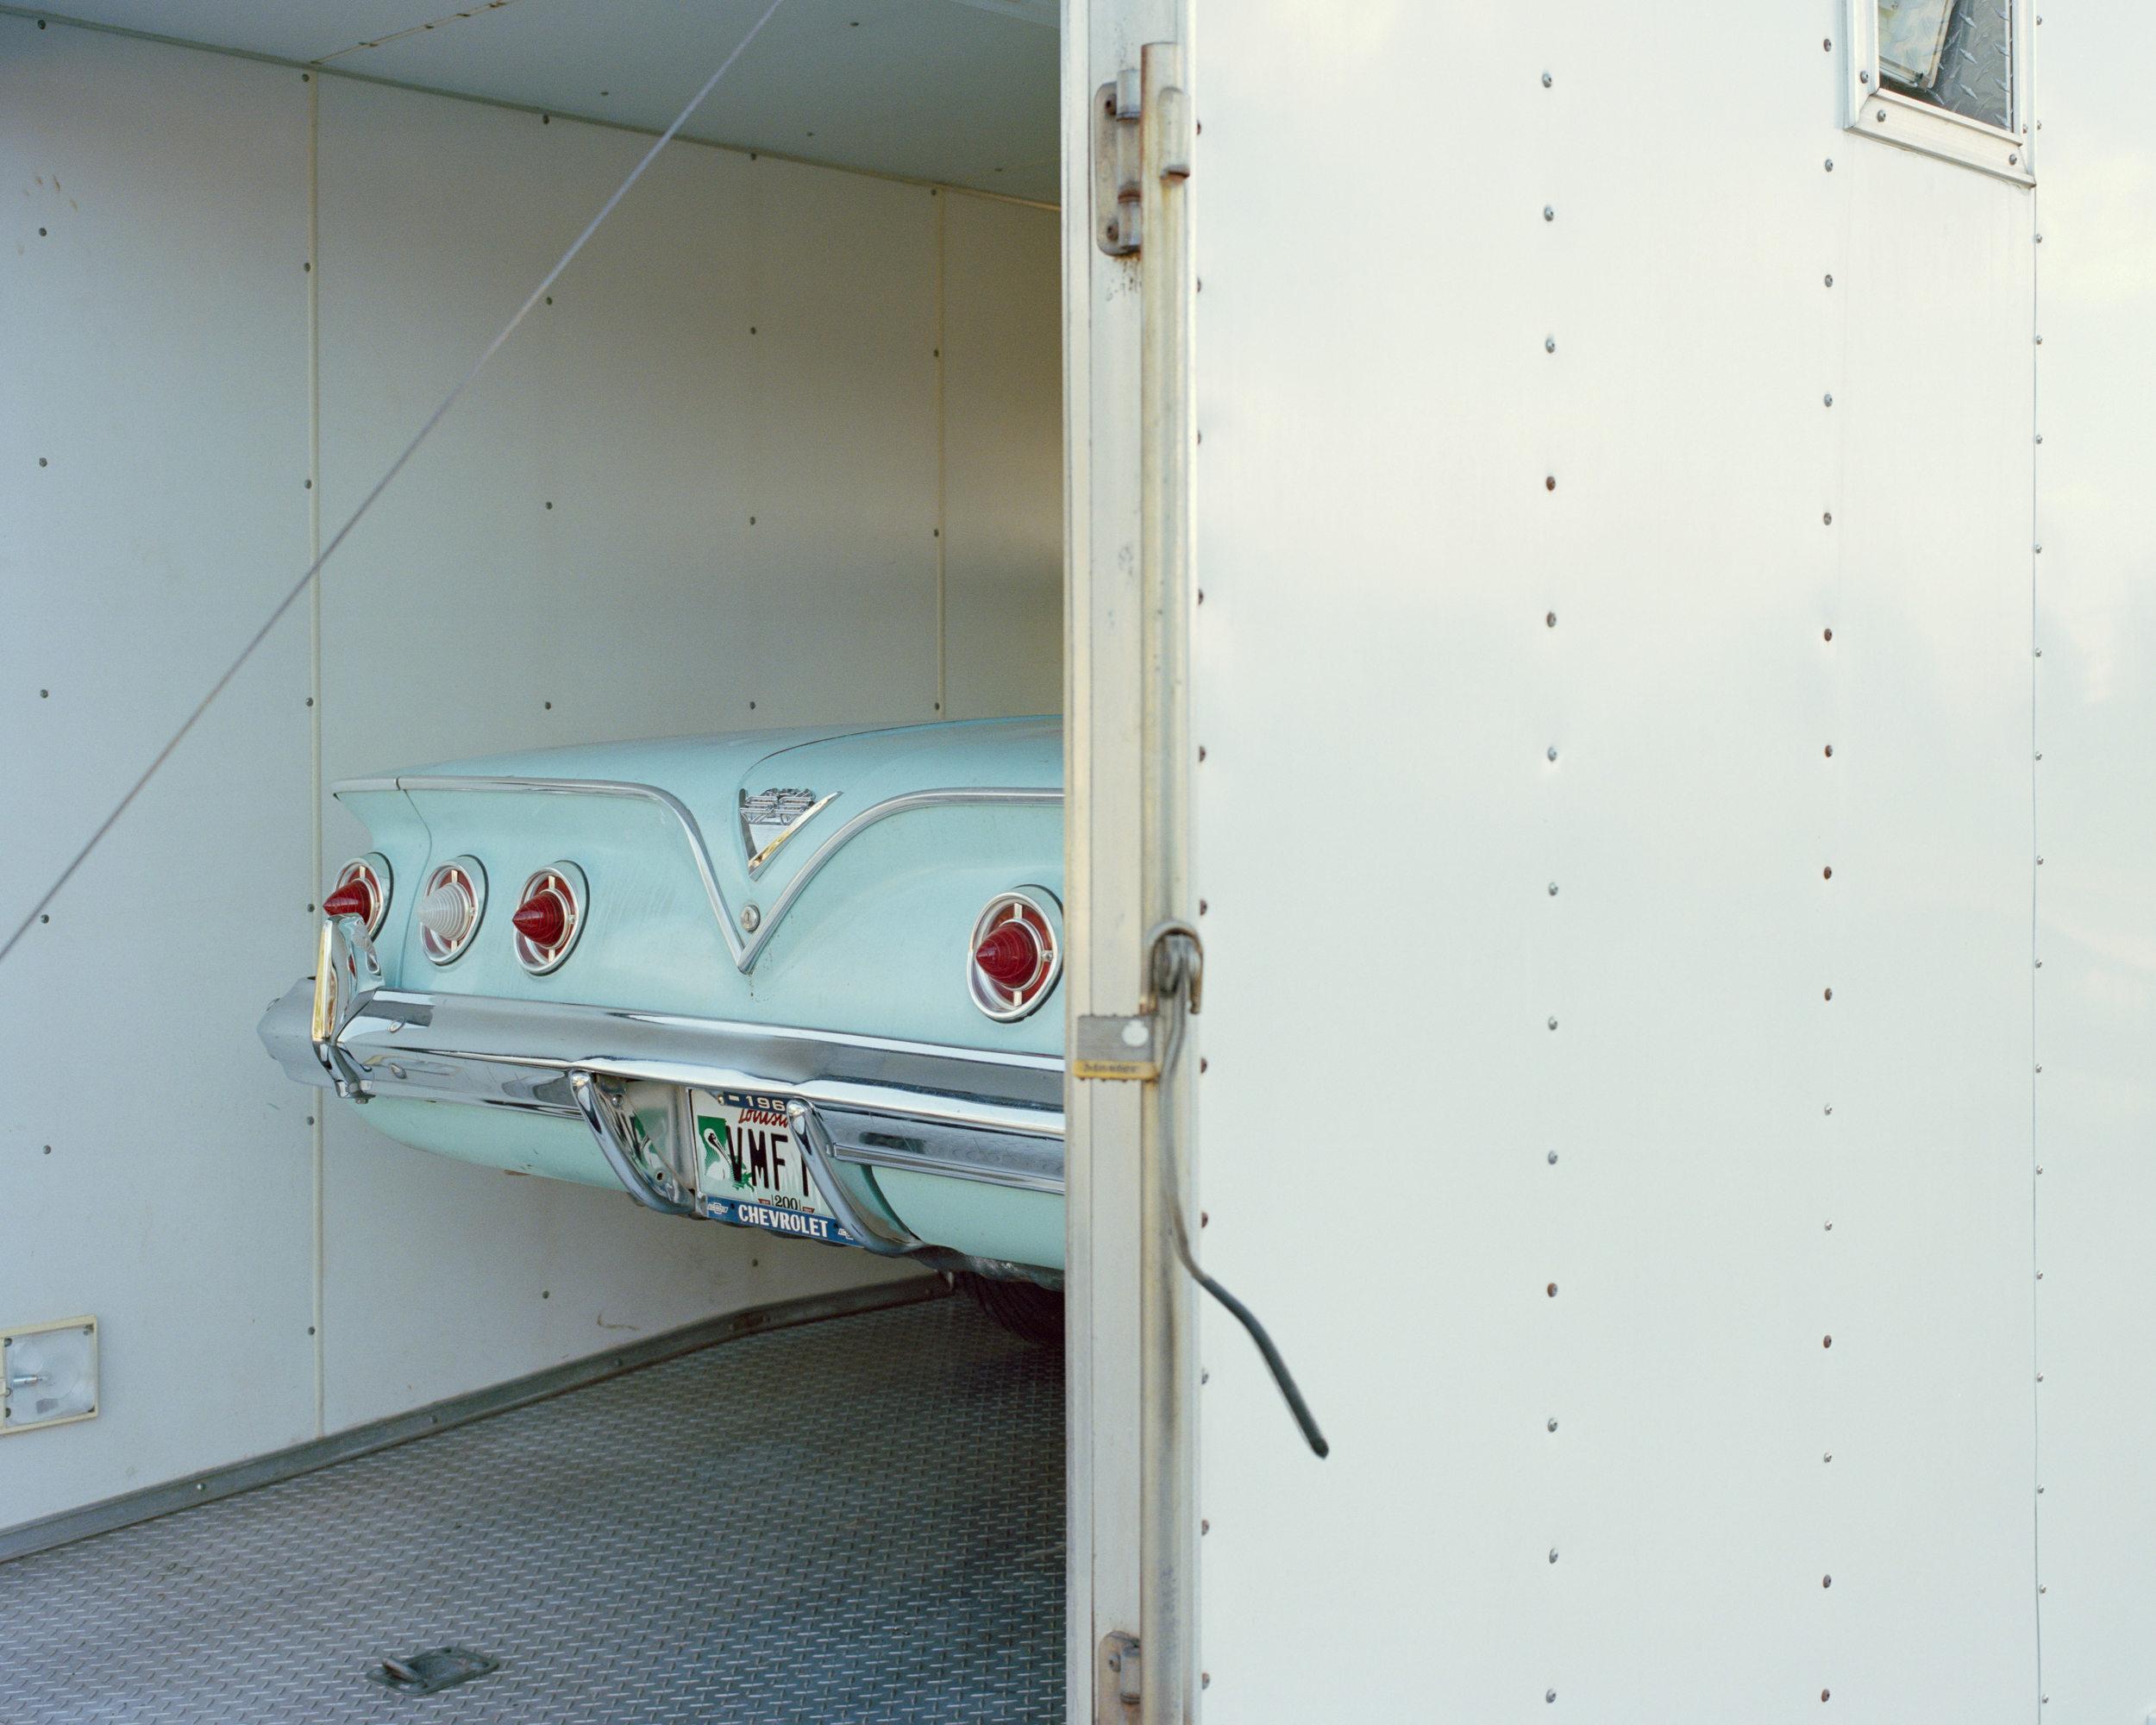 1961 Impala, New Orleans, LA